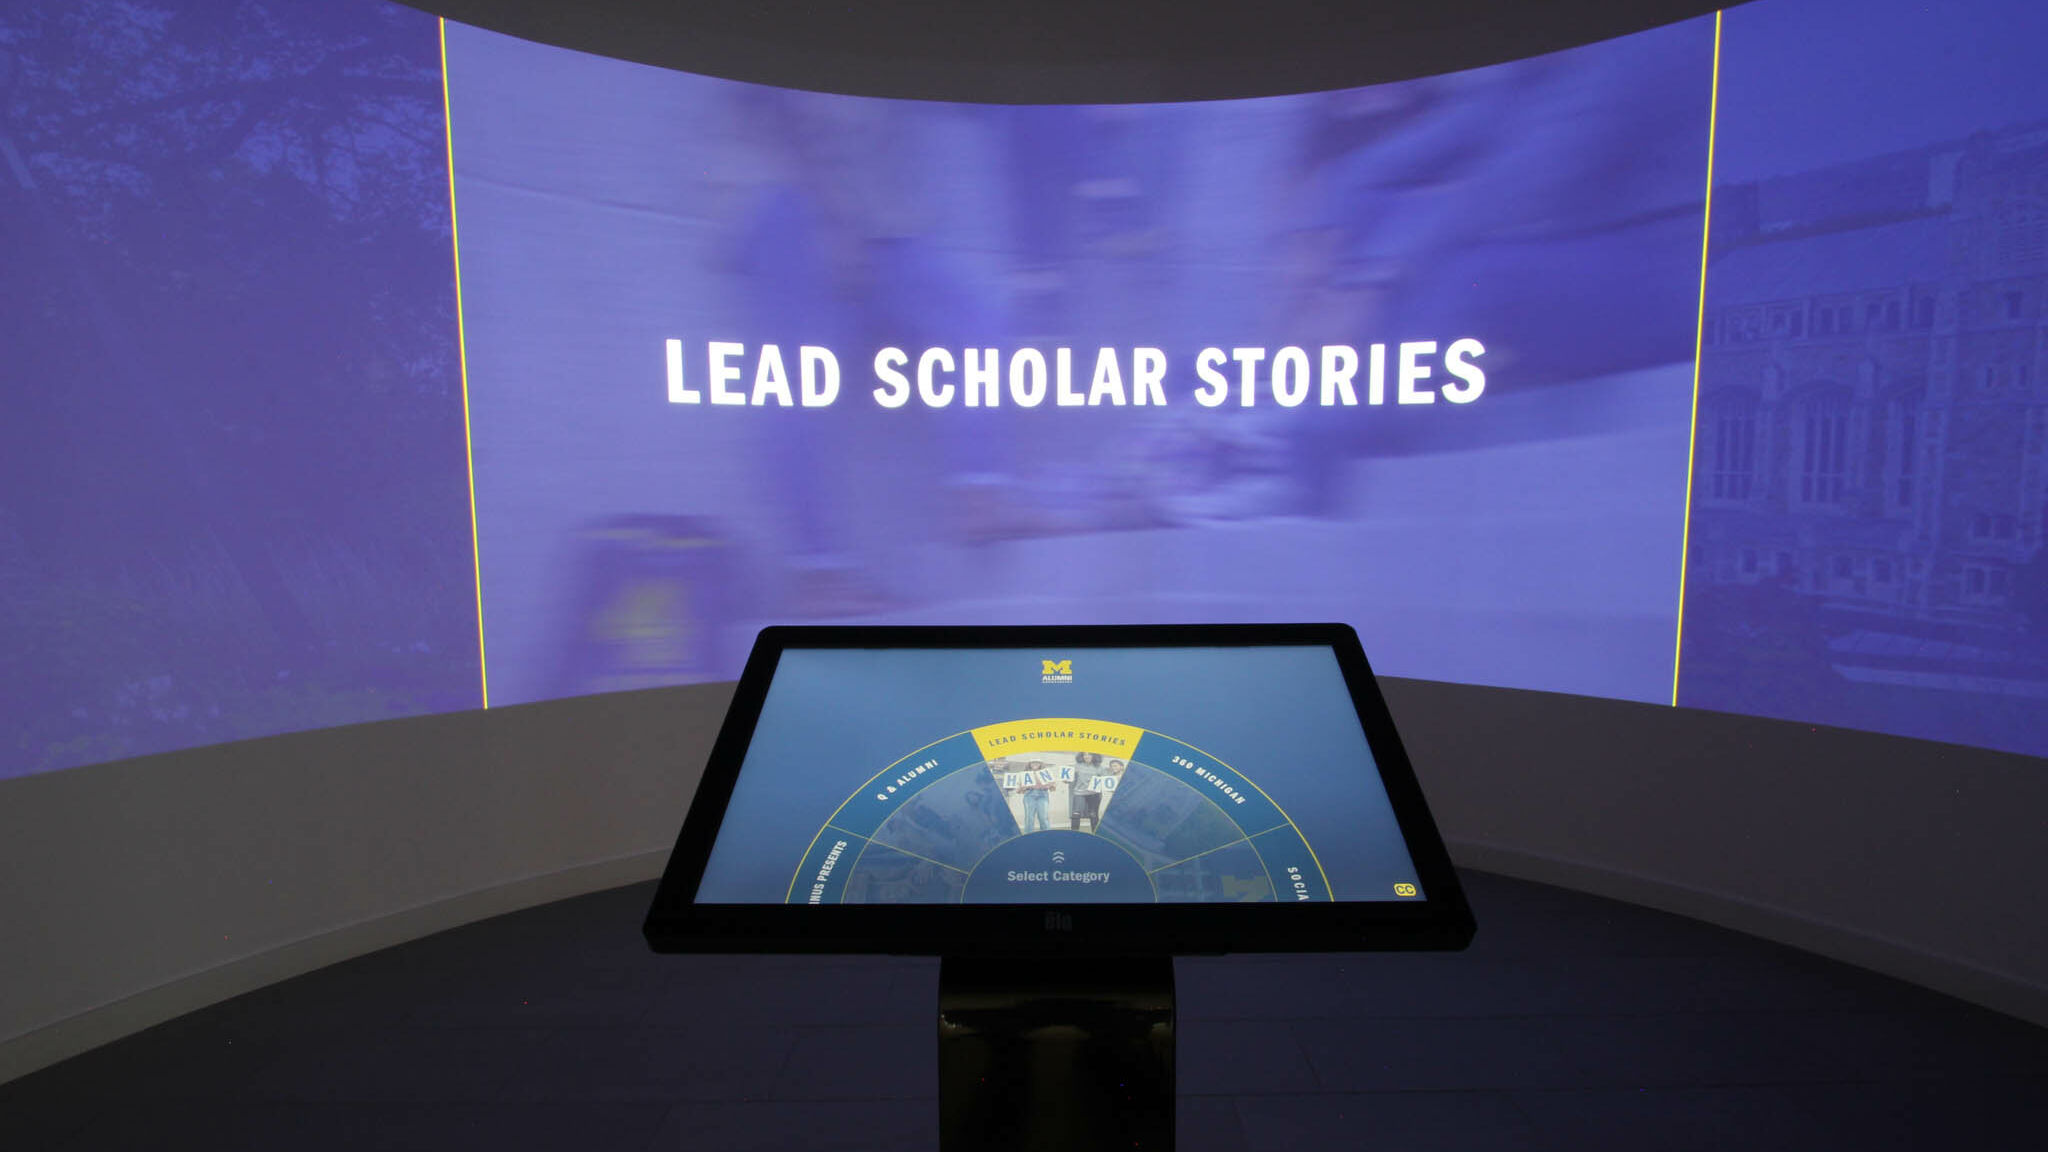 Exploring Lead Scholar Stories in the University of Michigan Alumni Center immersion room